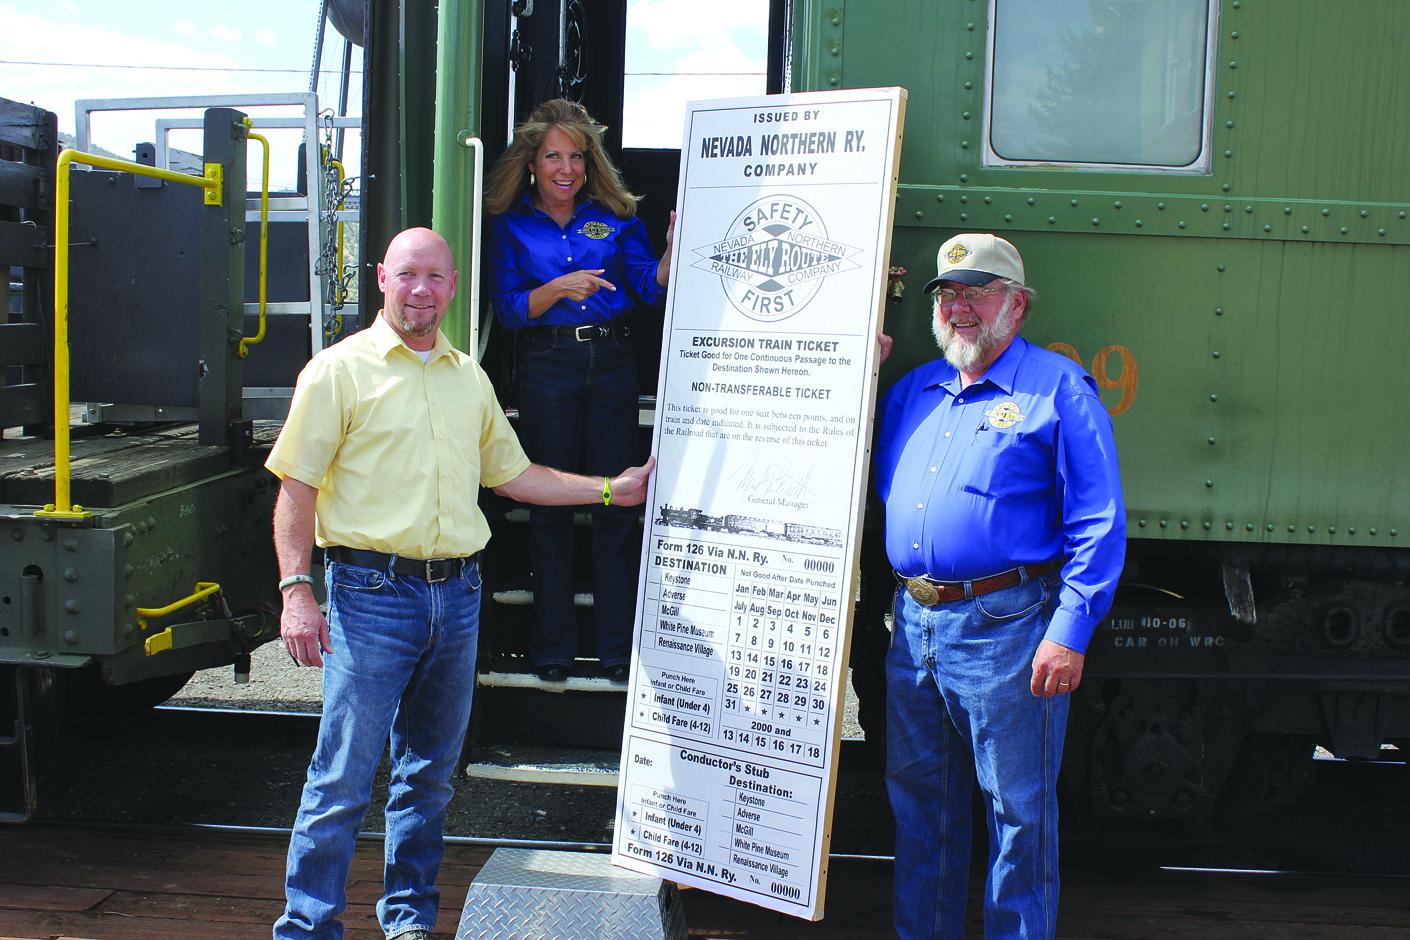 Robinson Nevada Mining, NNRy offers free train rides